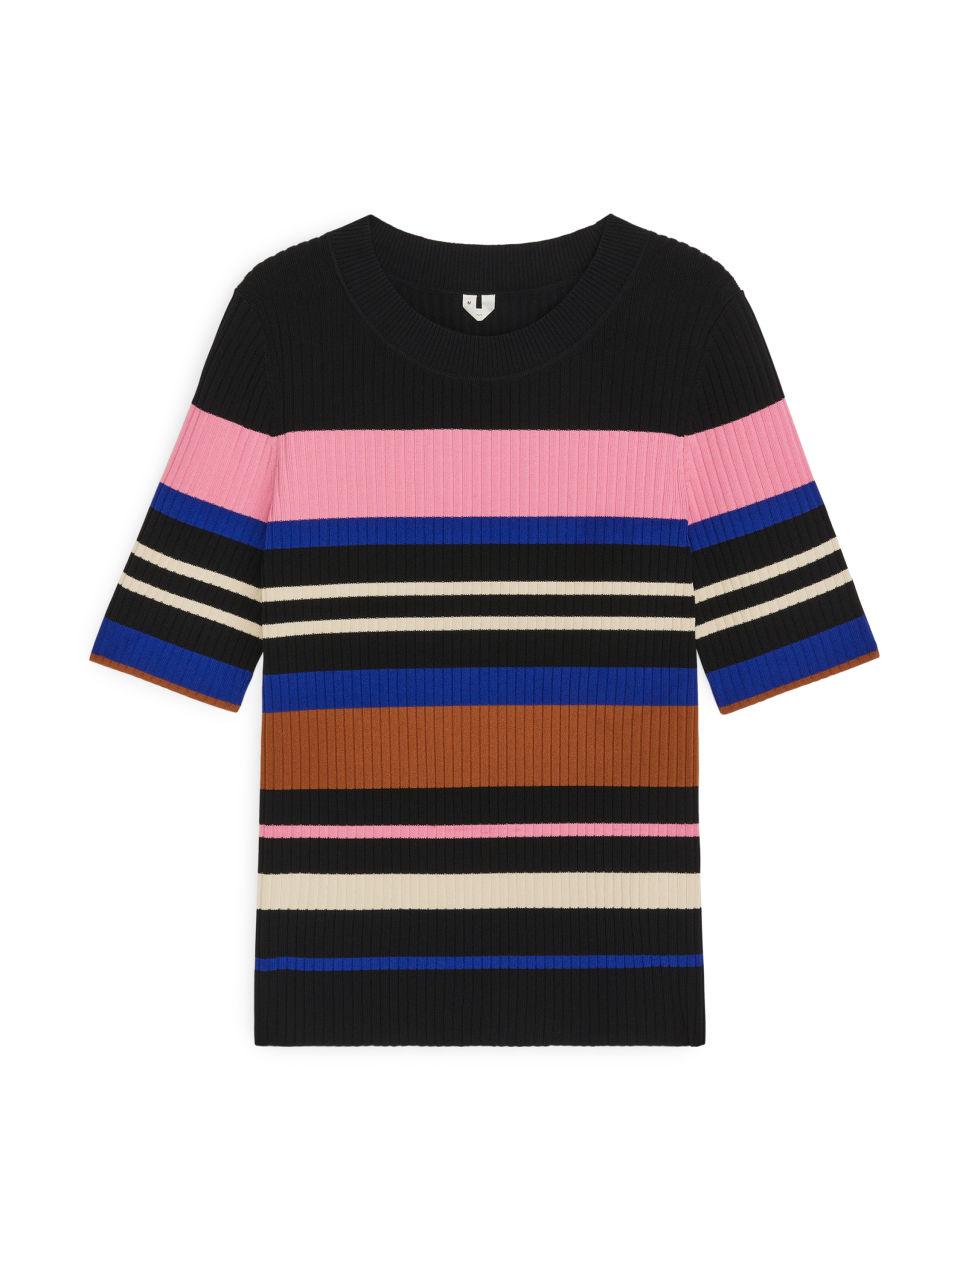 Rib-Knitted Top - Black